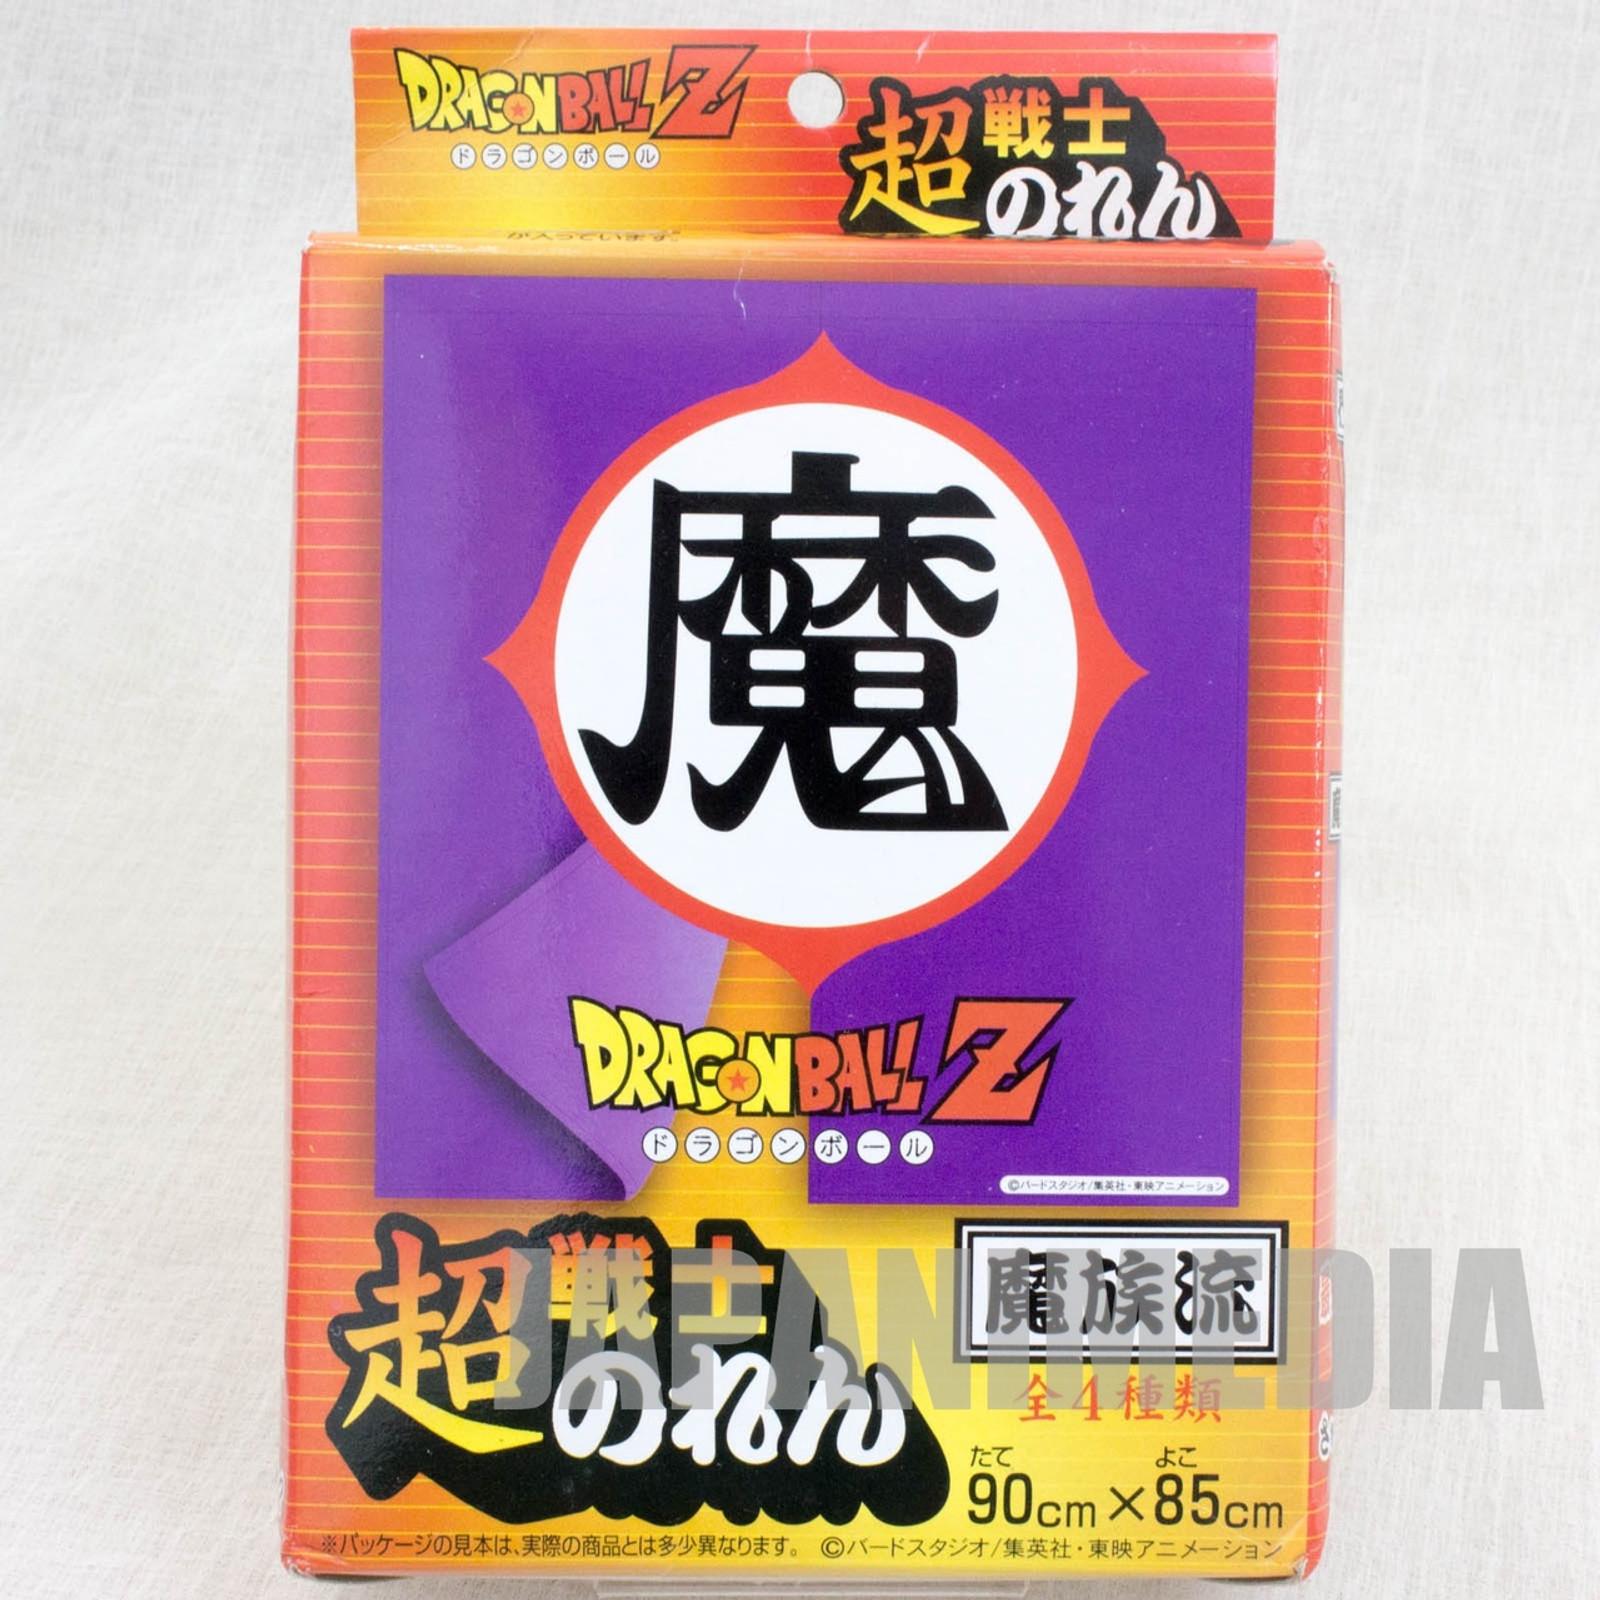 Dragon Ball Z Piccolo Inferno Mark Japanese Shop Curtains NOREN 90cmx85cm JAPAN